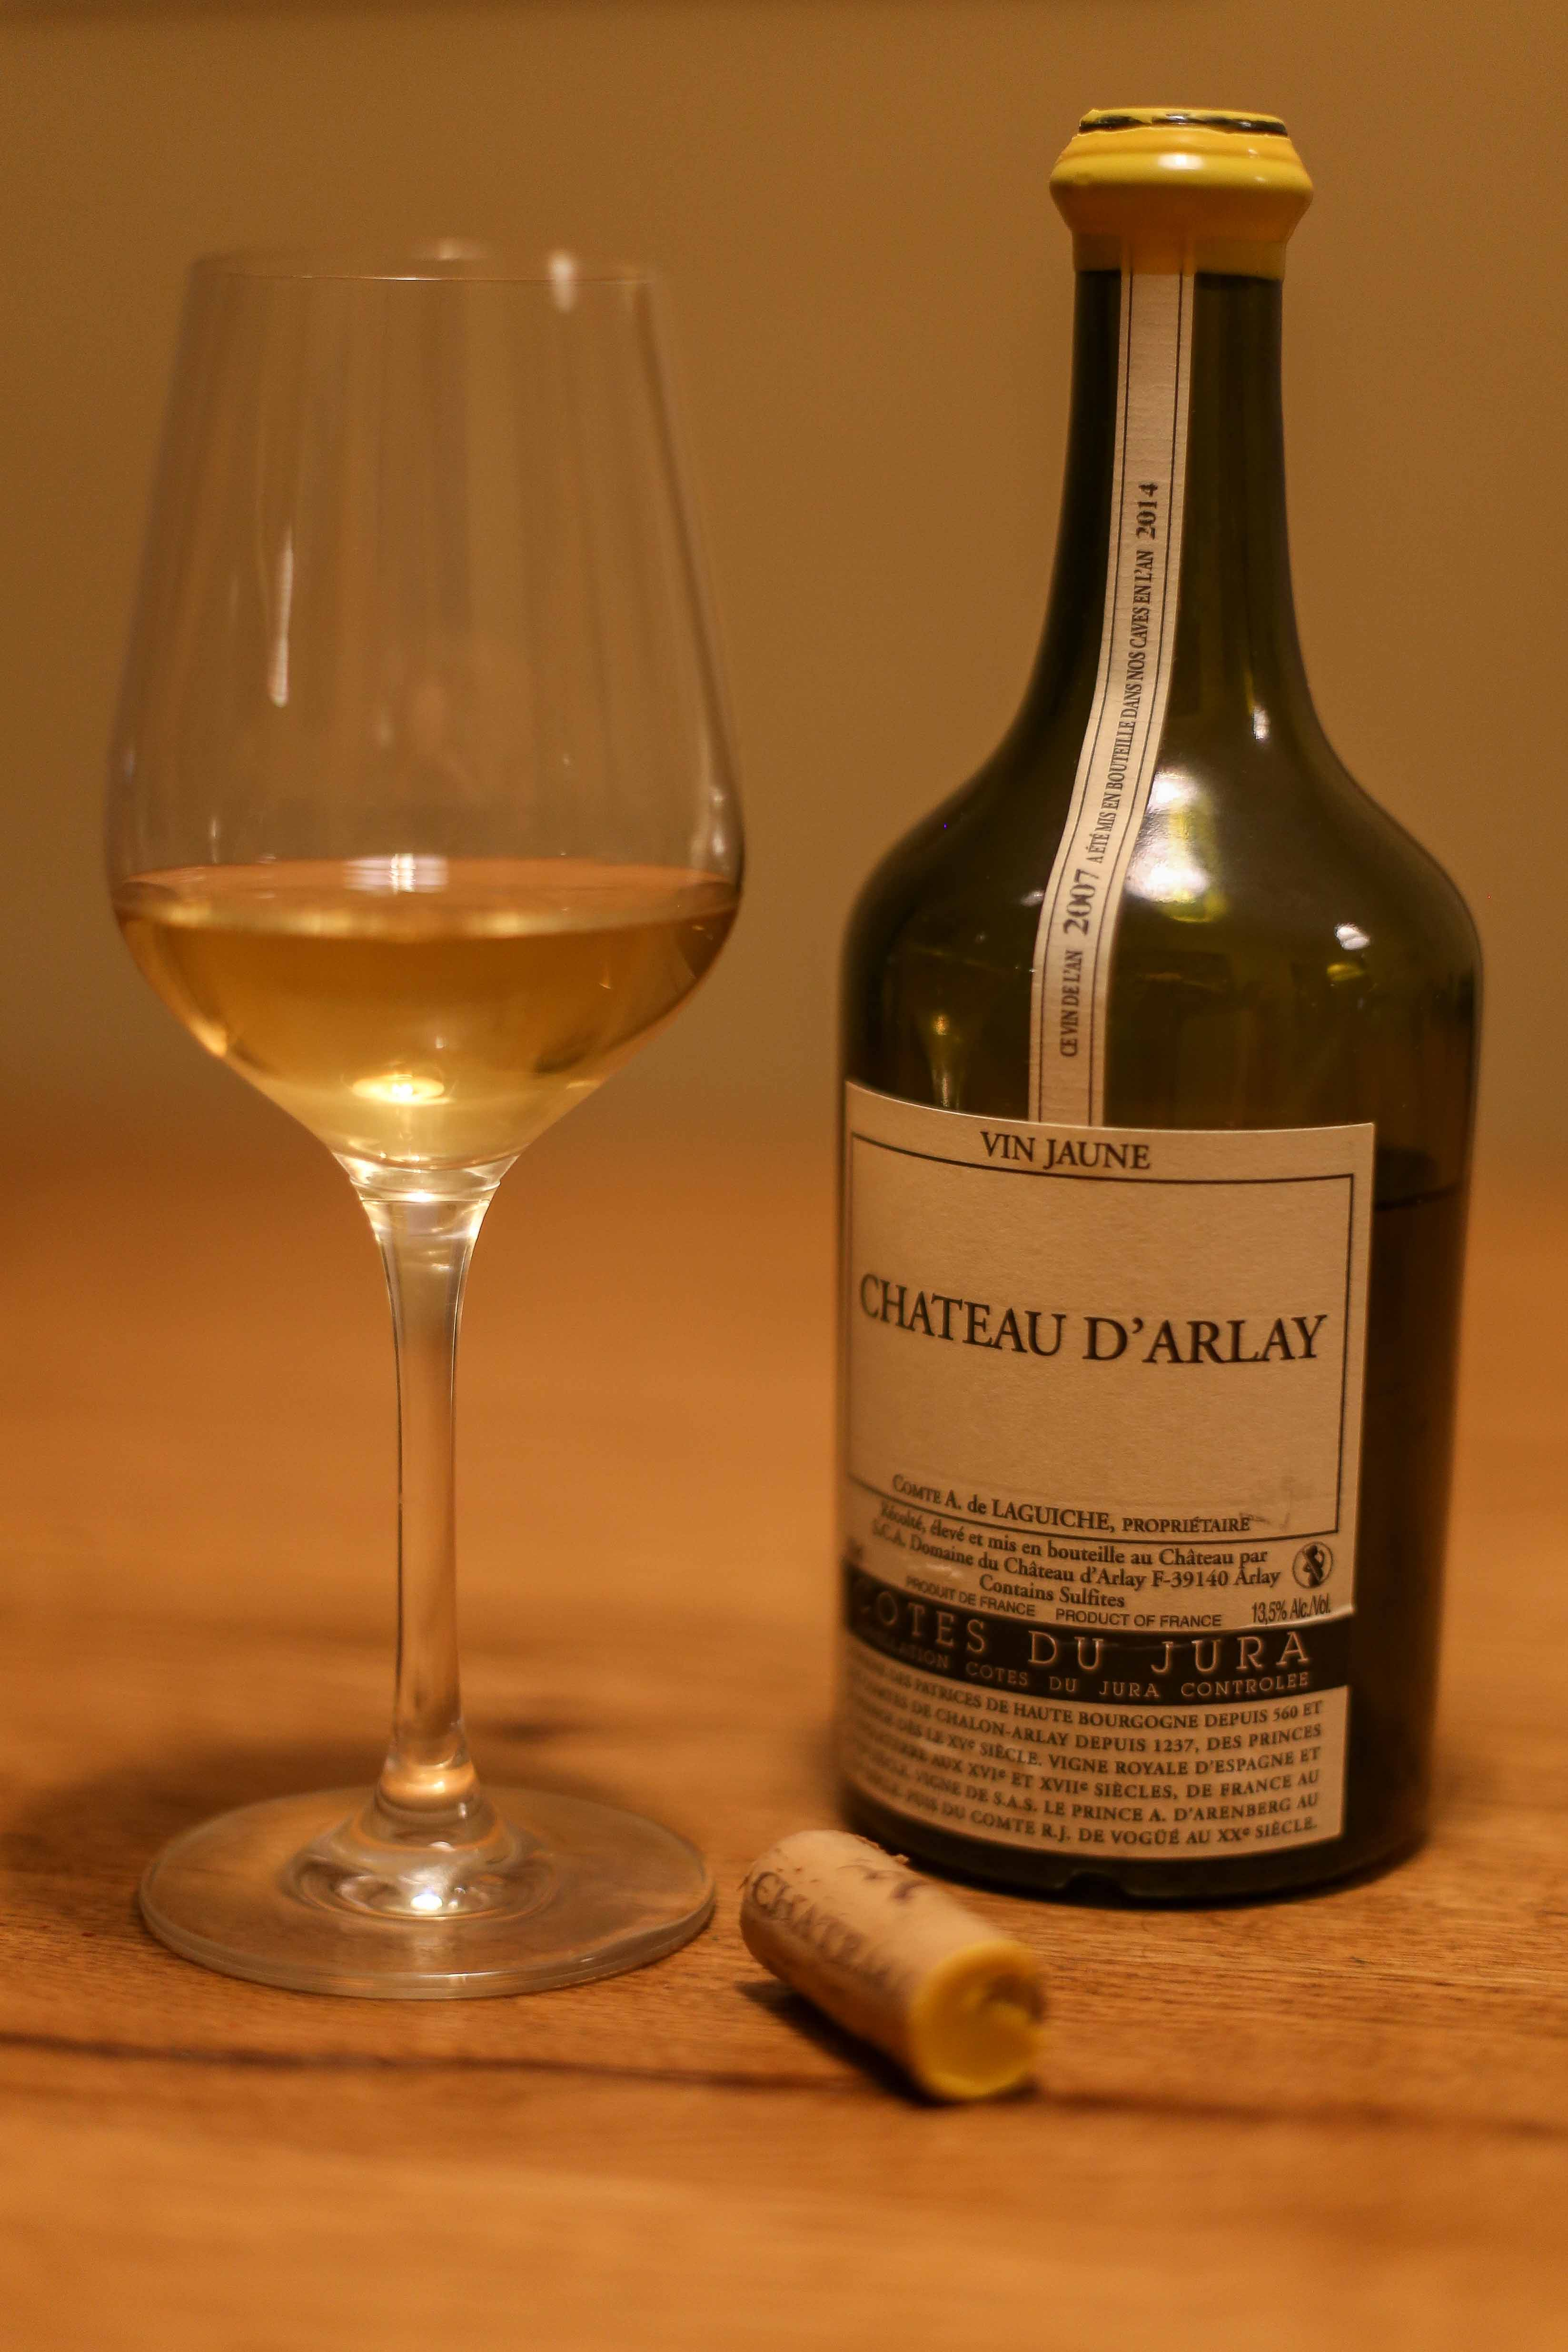 chateau_d_arlay_vin_jaune_2007_web-2